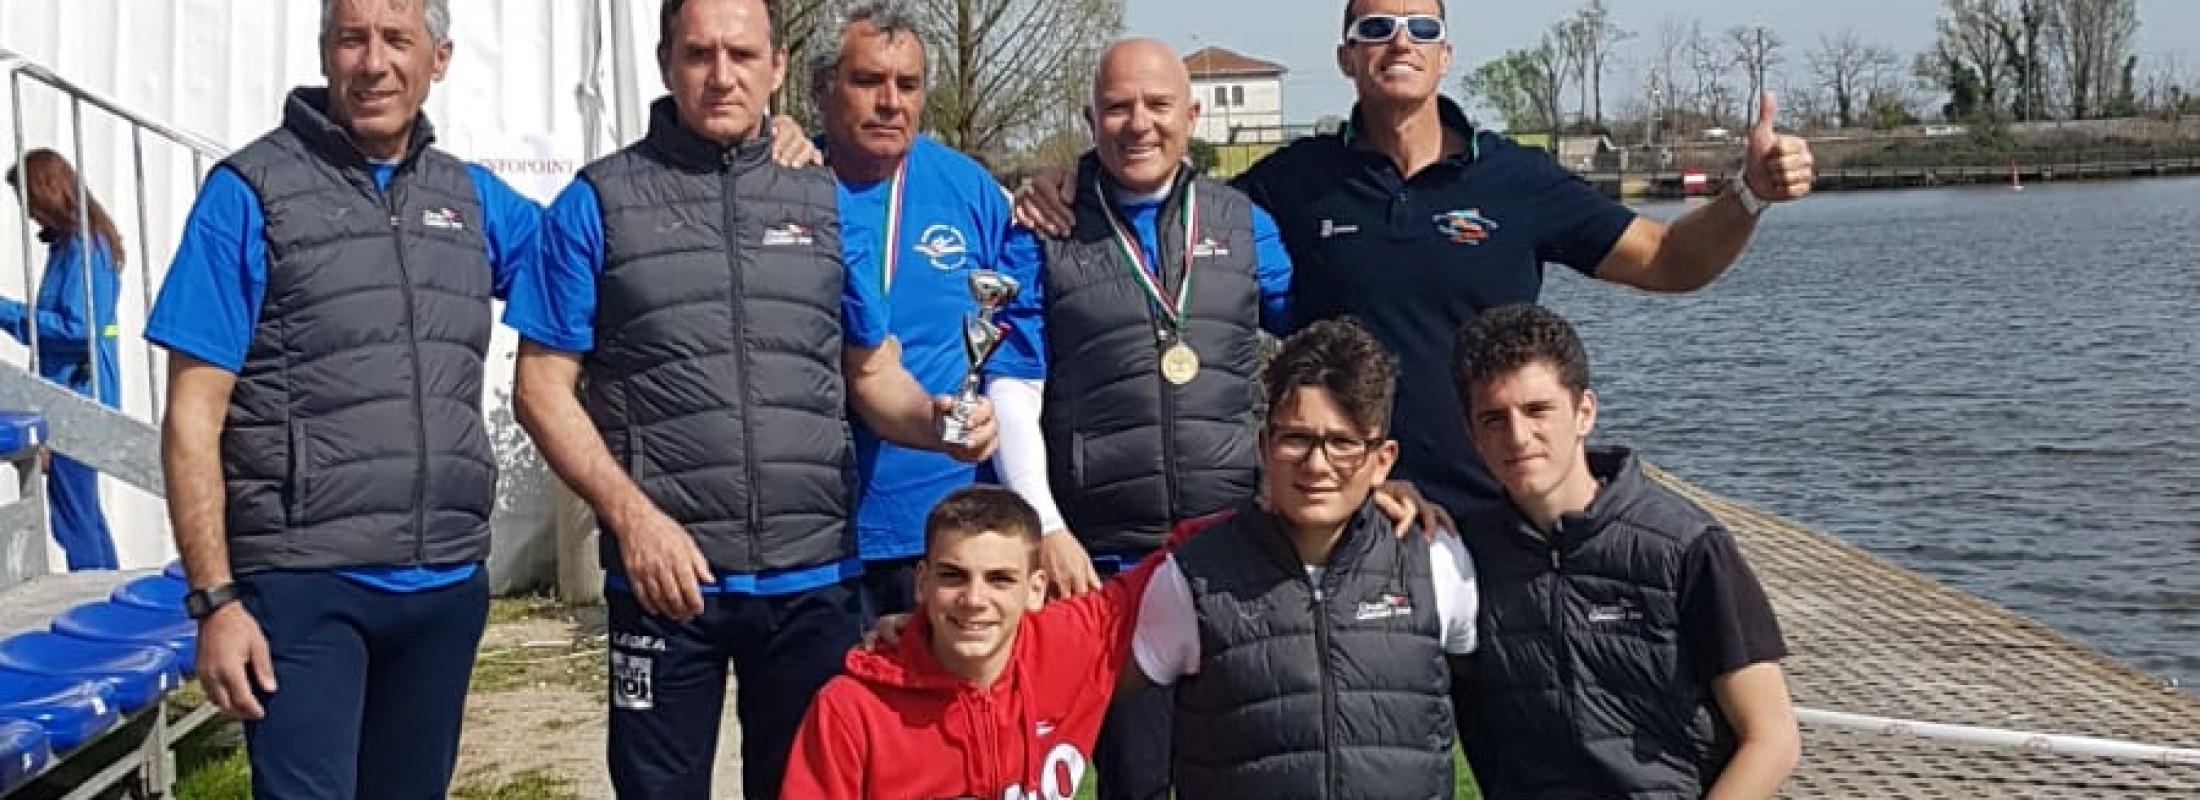 CANOA KAYAK – Campionati Italiani di Fondo – Mantova